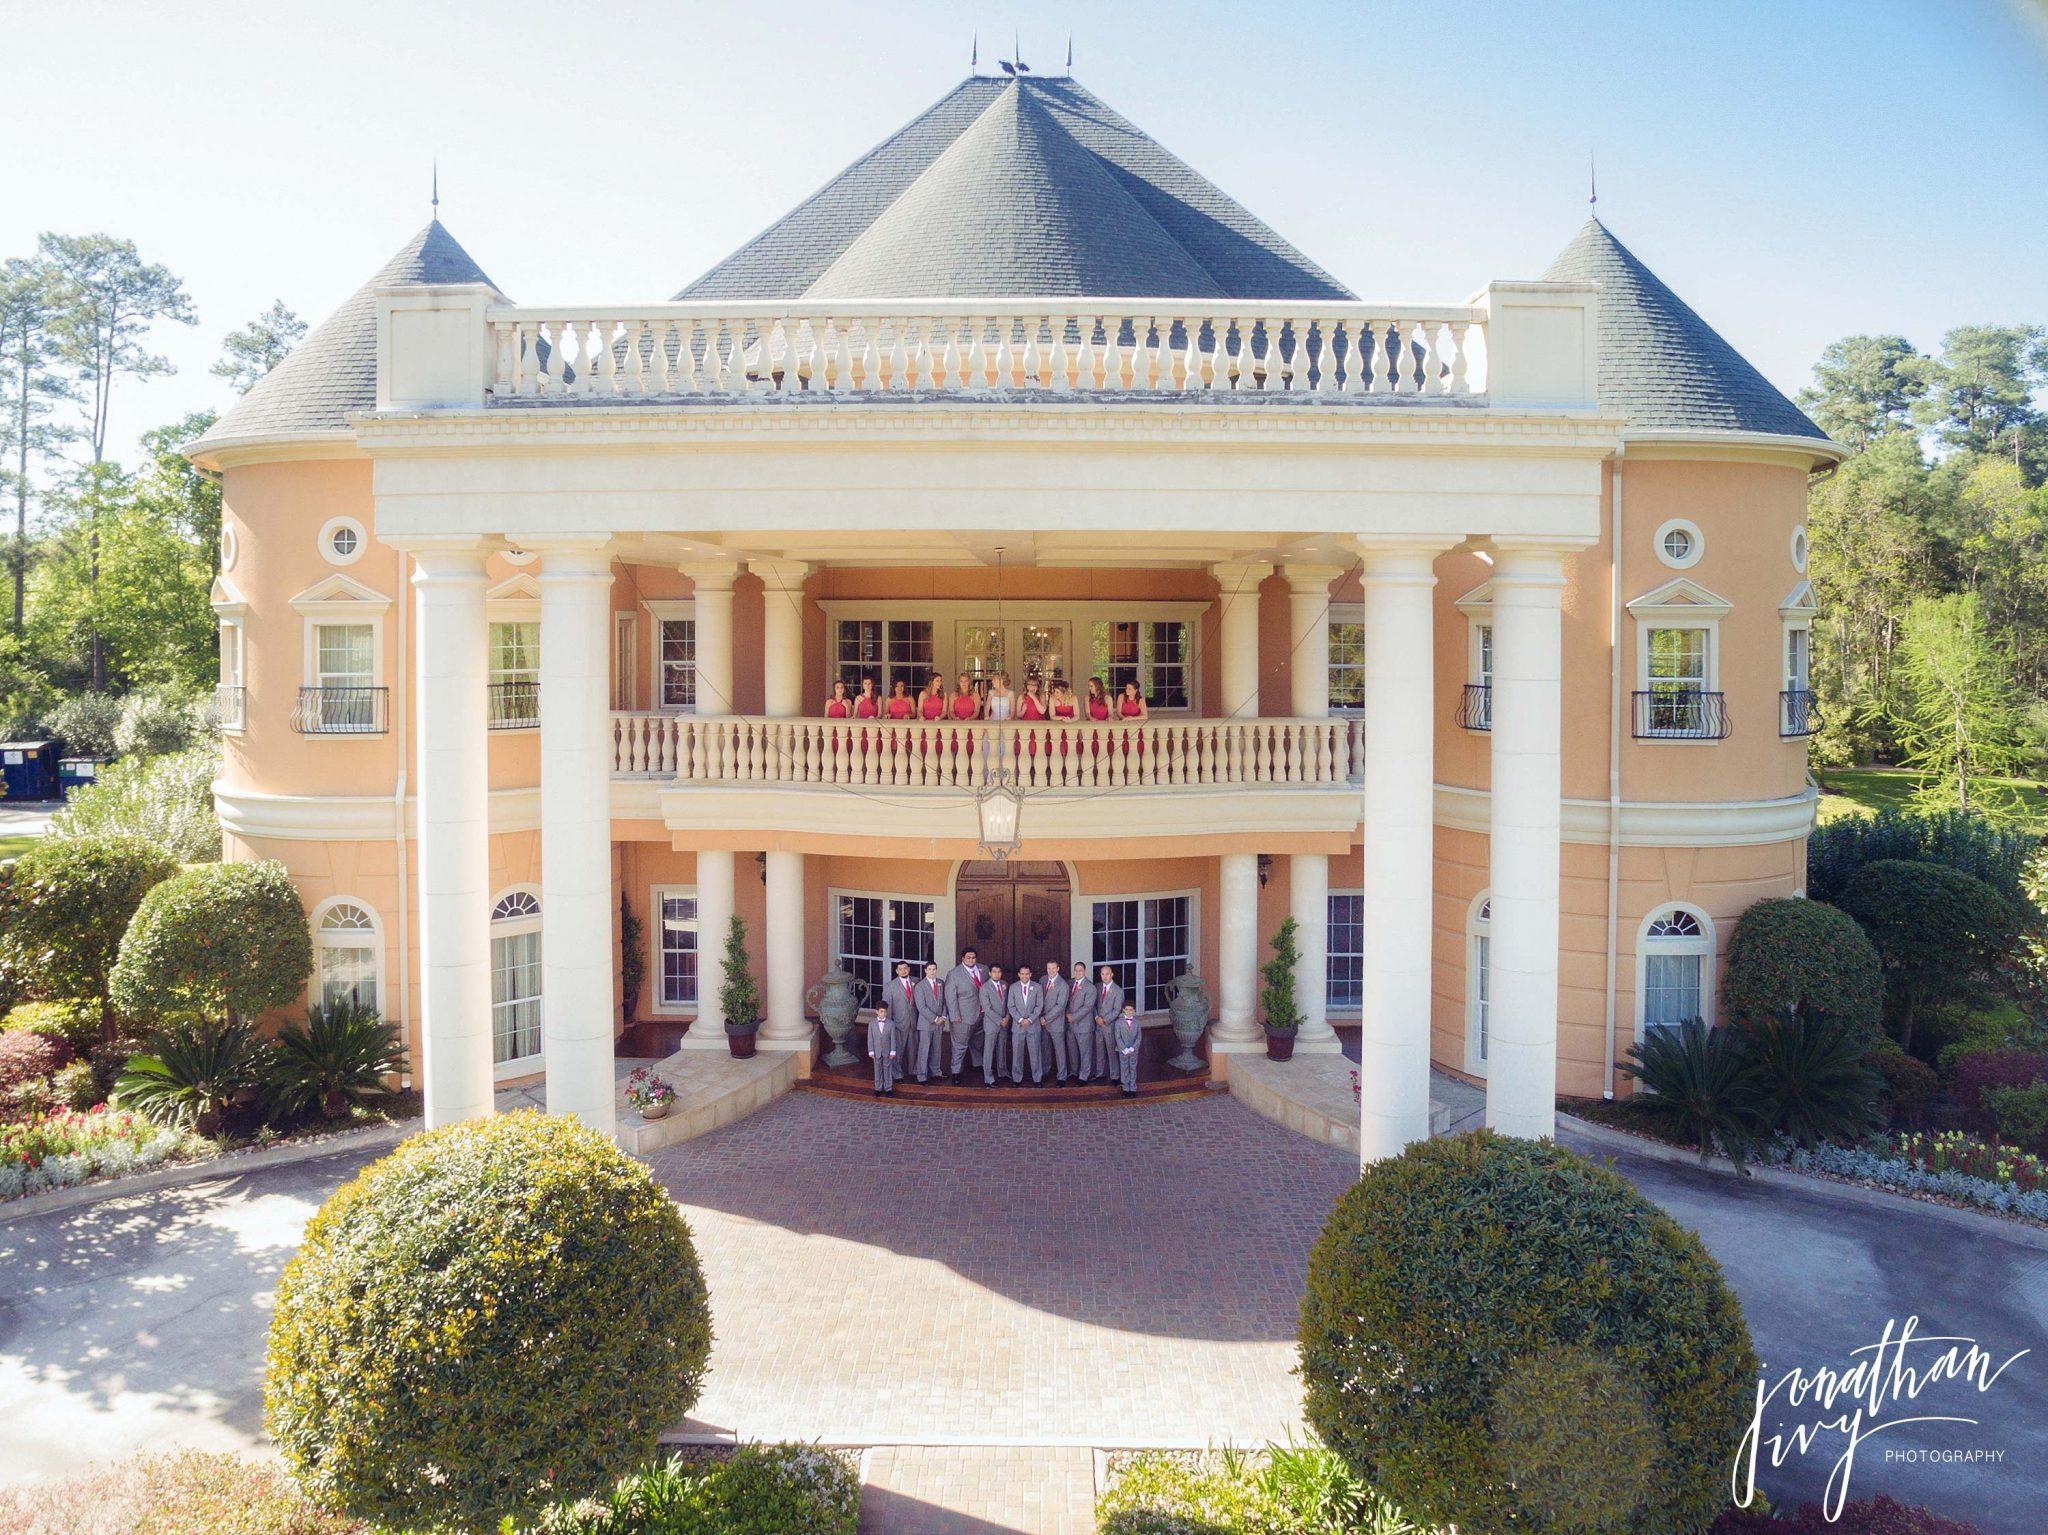 Chateau-polonez-wedding-houston_0007